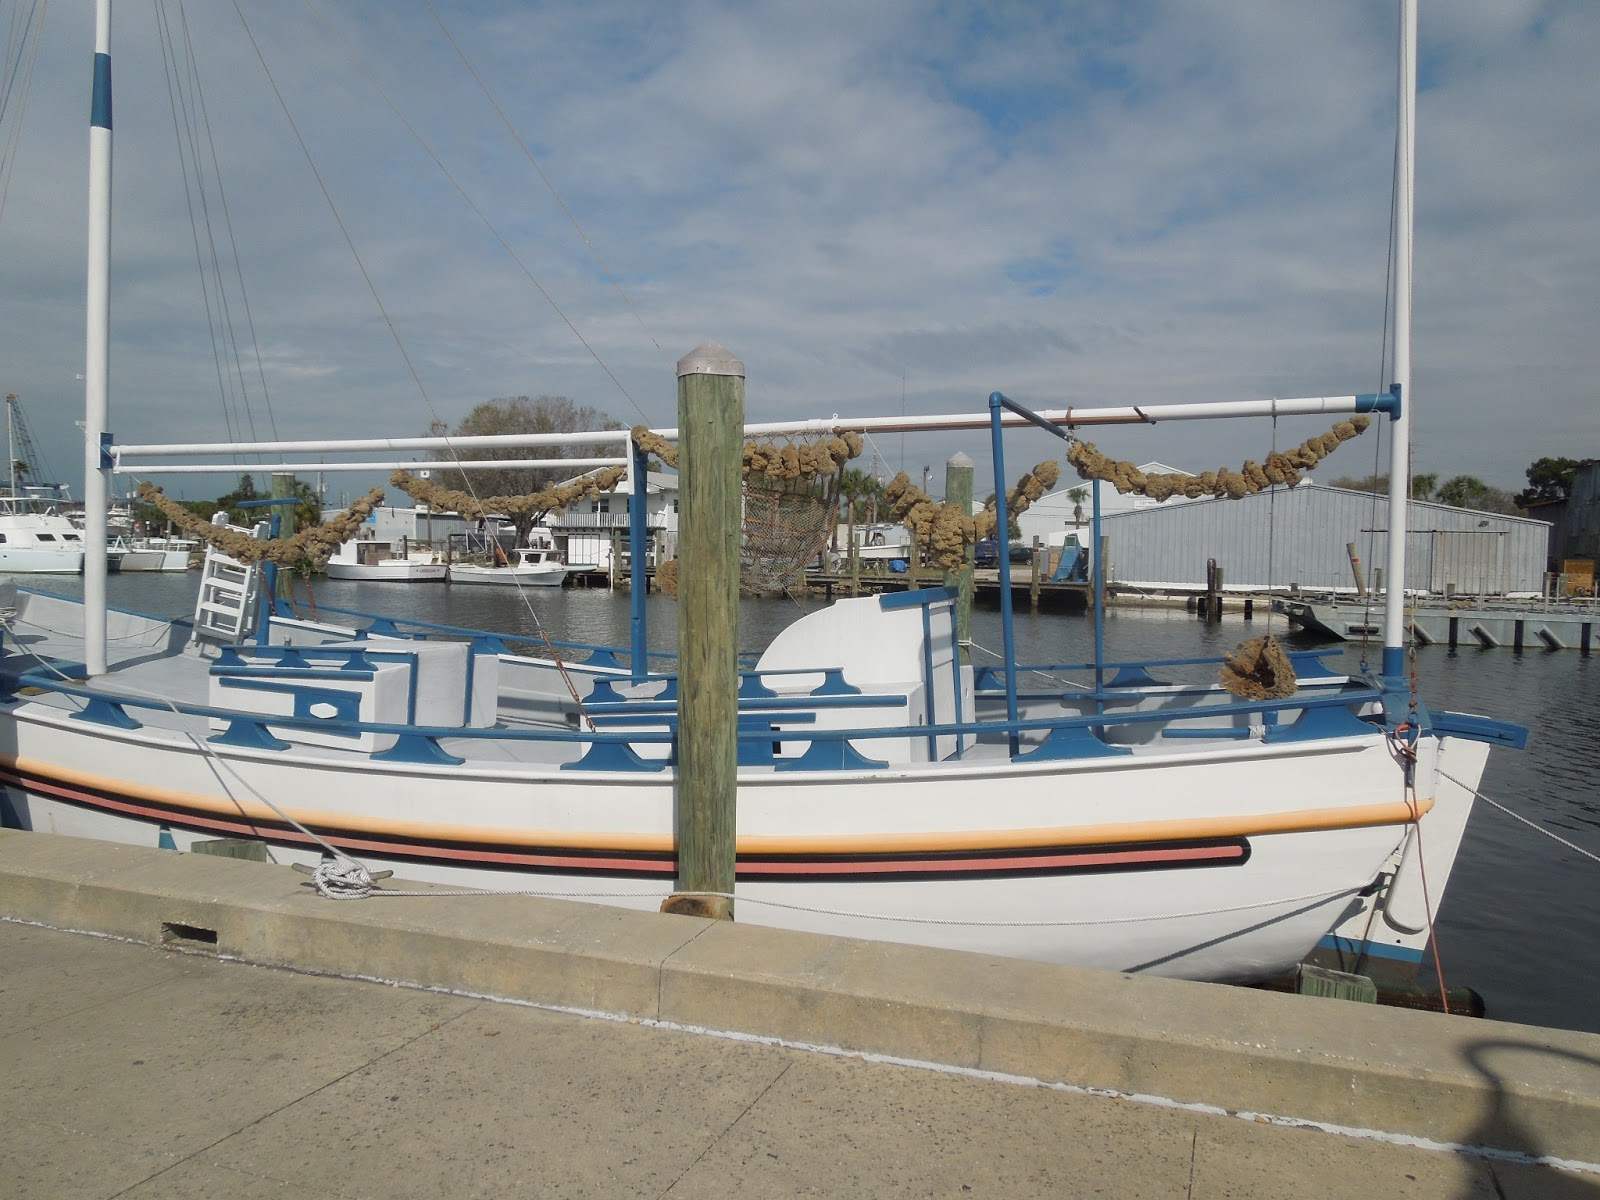 Florida 2013 tarpon springs greek sponge fishing community for Tarpon springs fishing